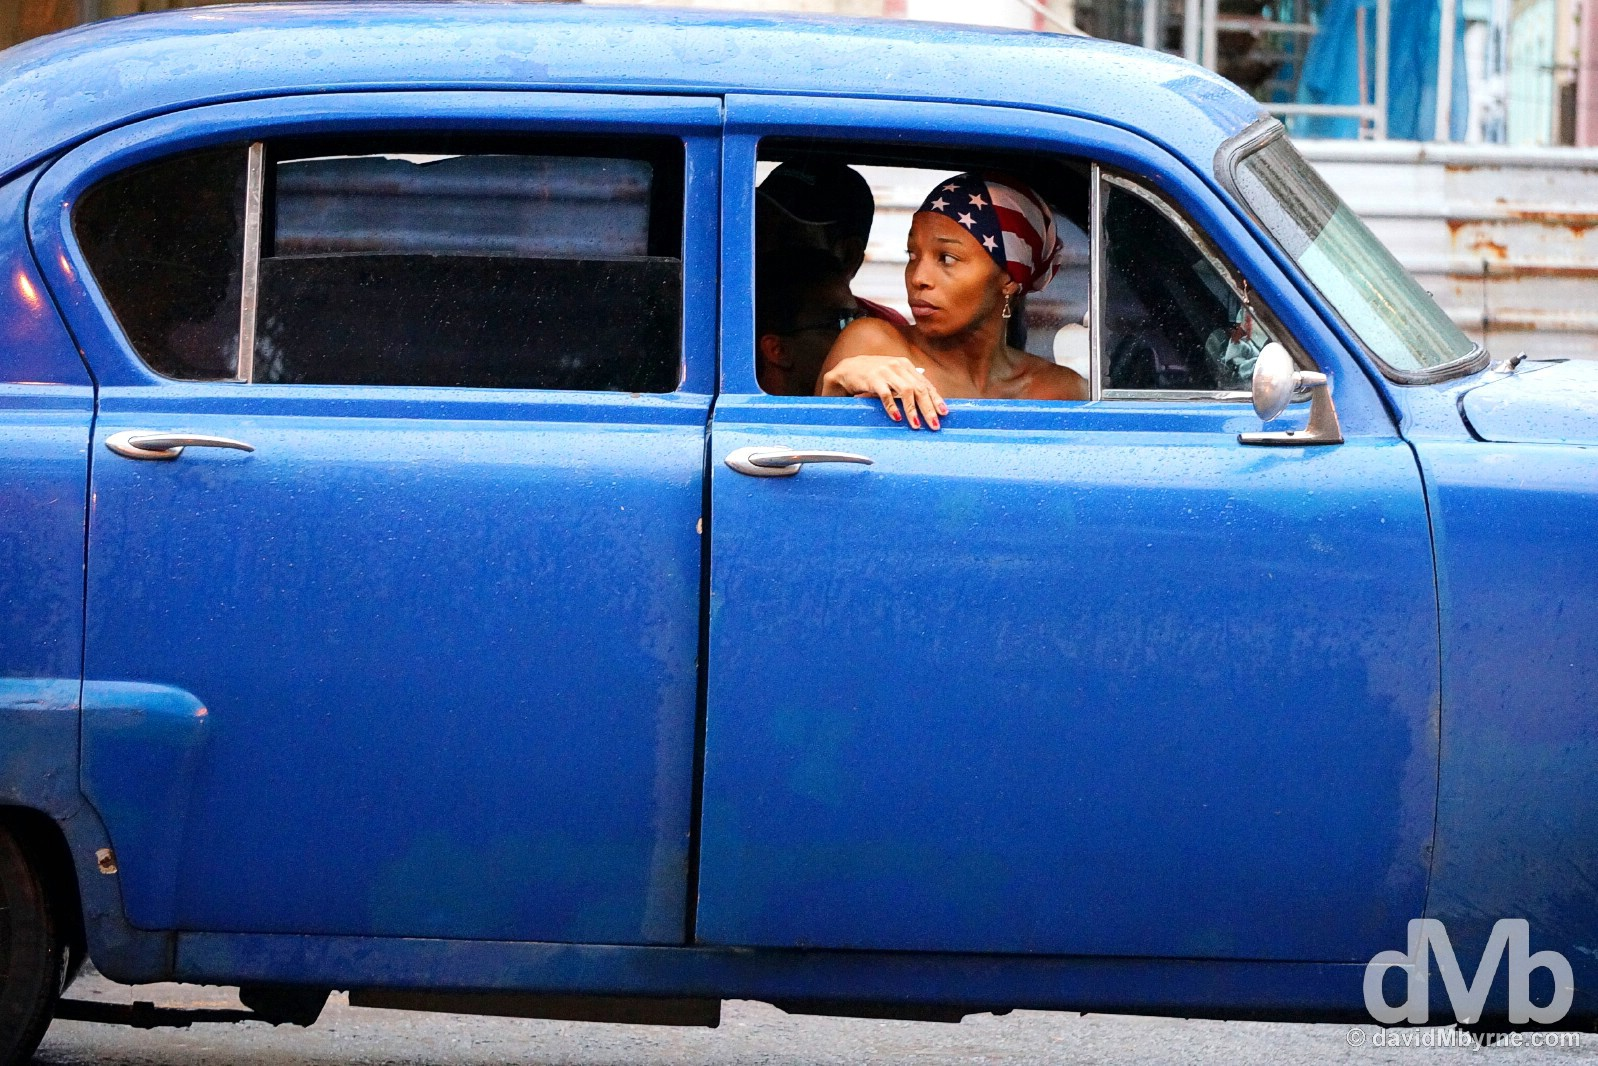 On the streets of Havana, Cuba. April 30, 2015.